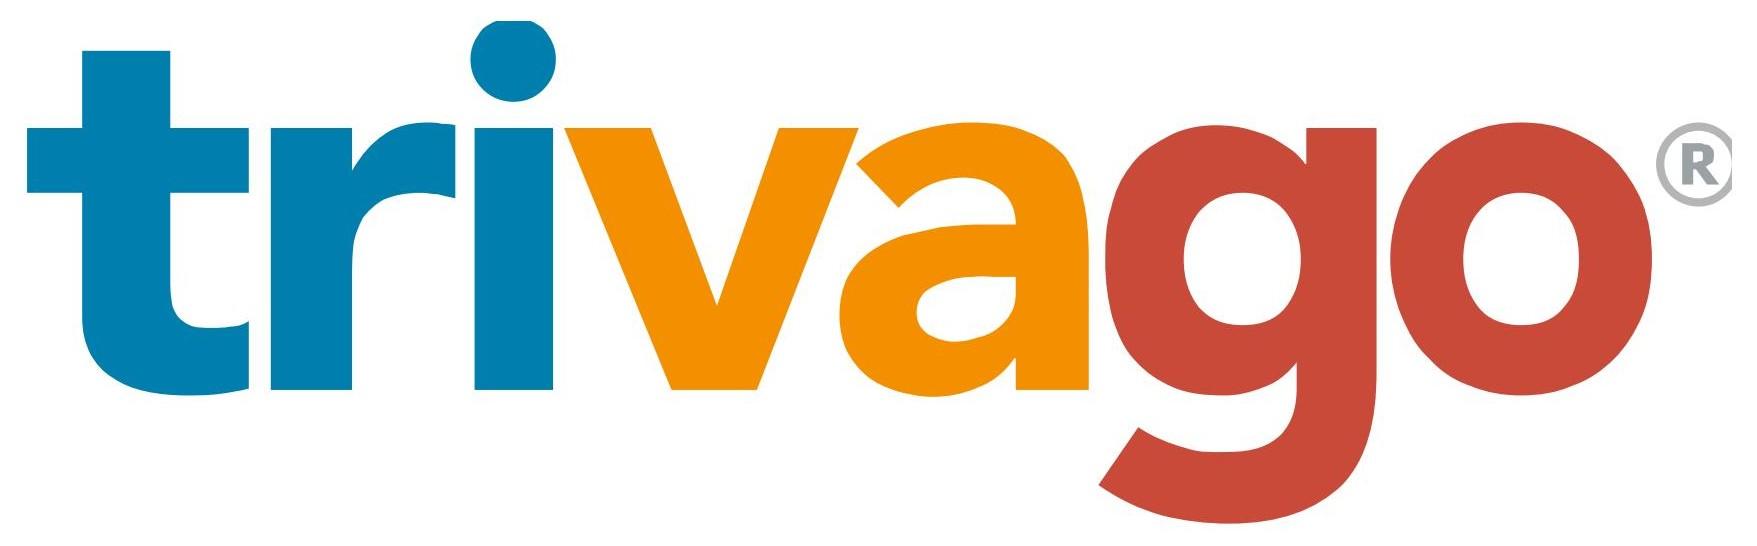 Trivago Logo PNG Transparent LogoPNG Images